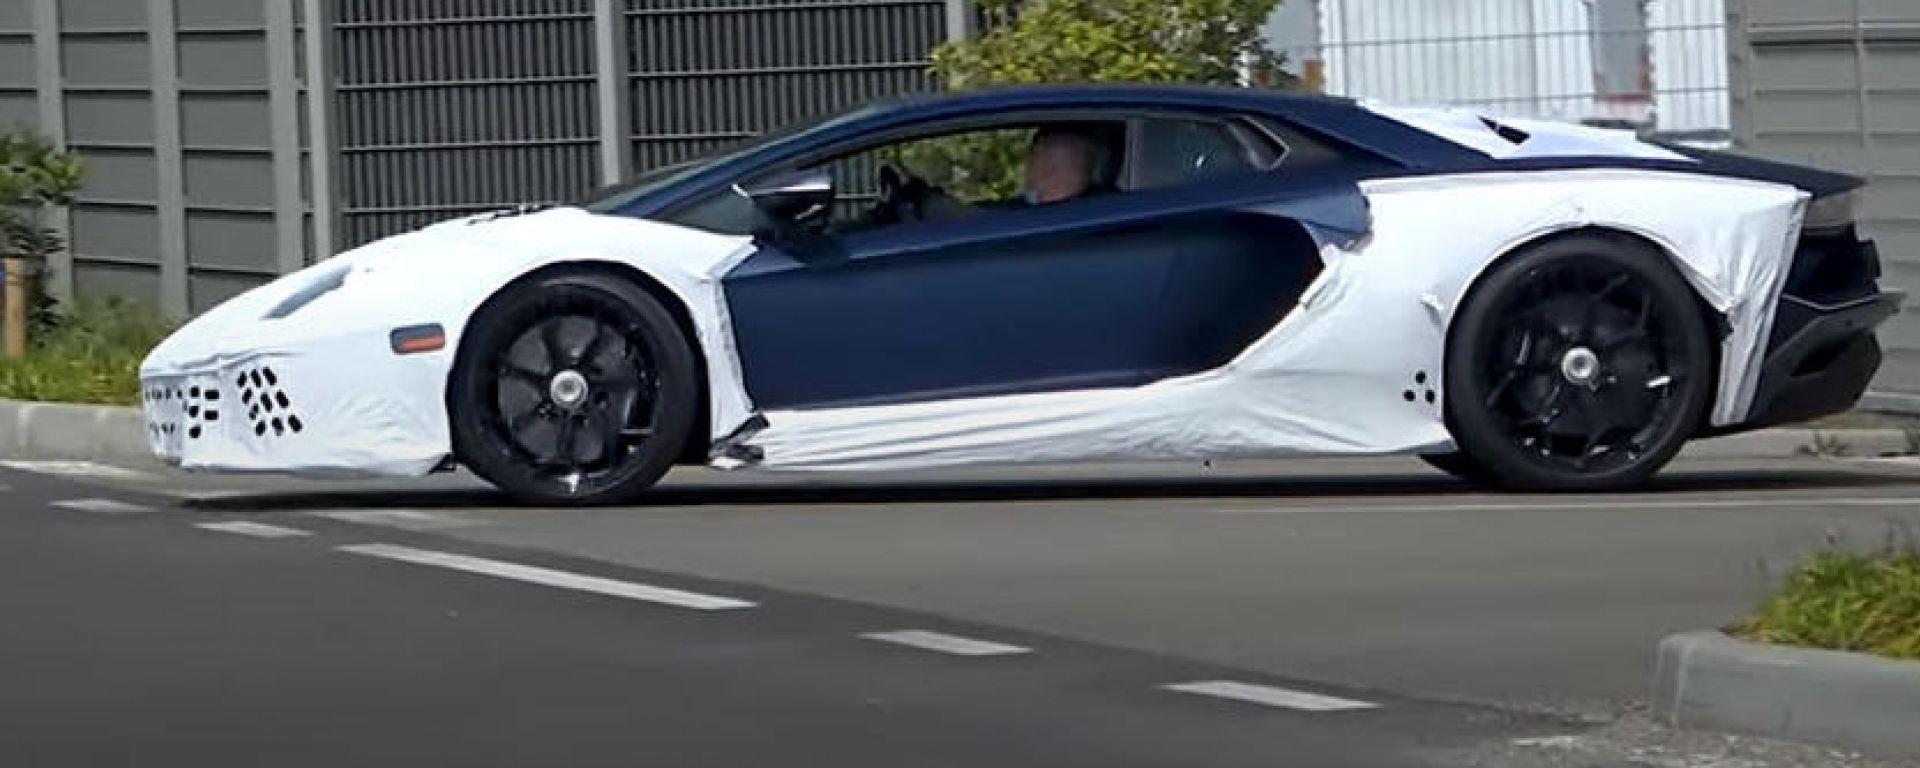 Lamborghini Aventador SJ Hybrid? Fotogrammi dal video spia